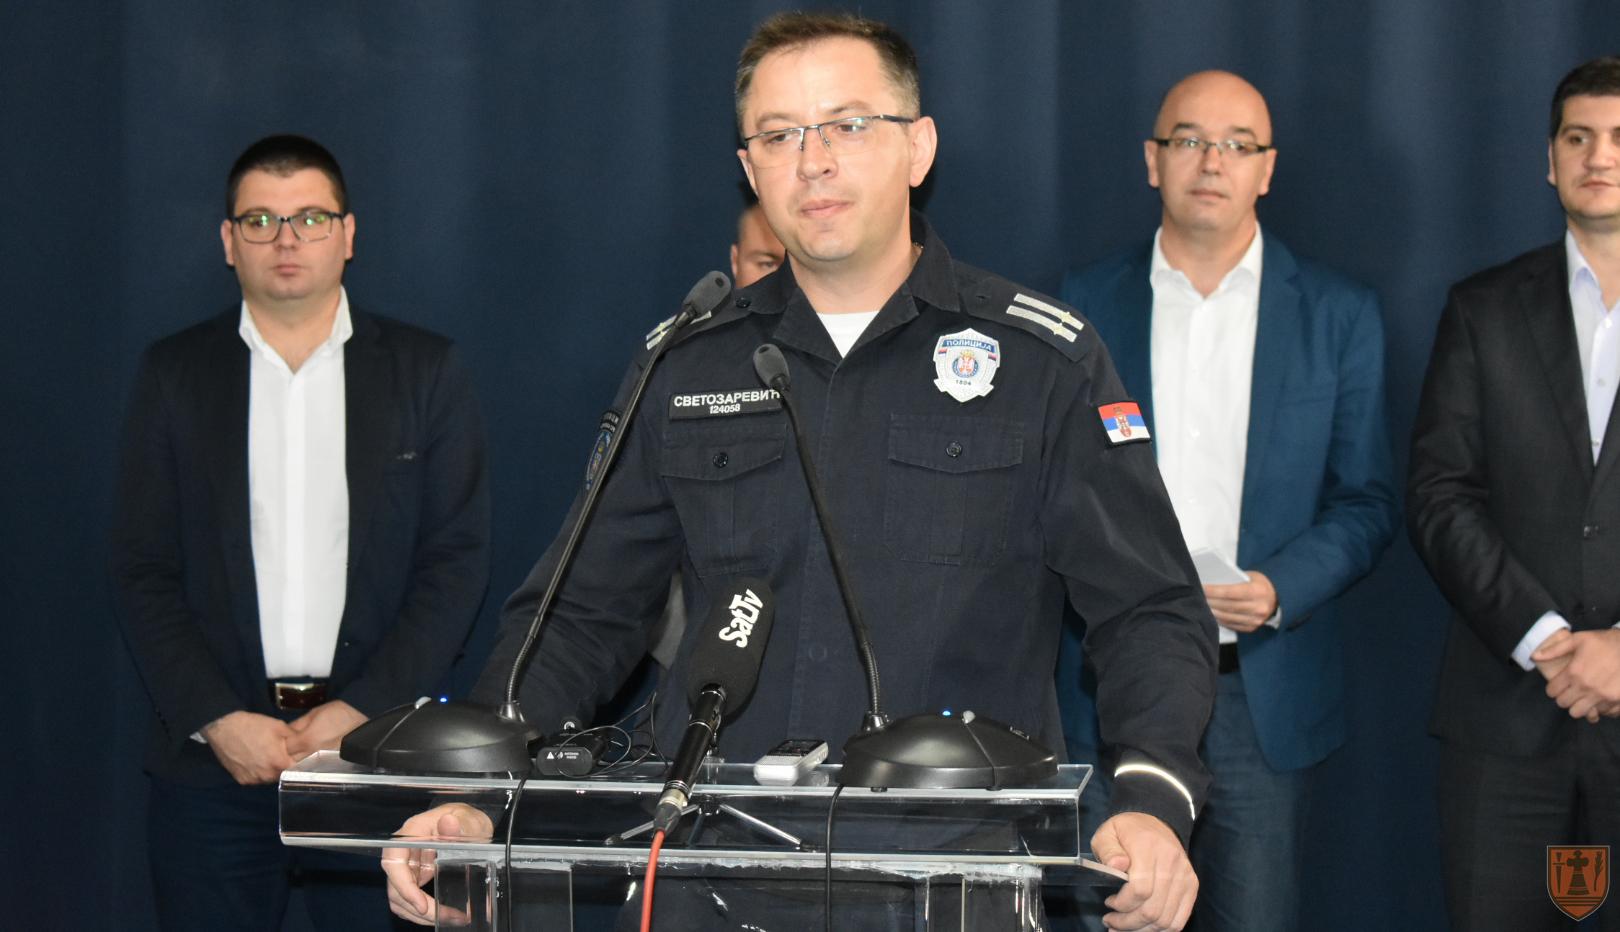 Dodeljeni panciri za pripadnike policijske uprave Požarevac 17370